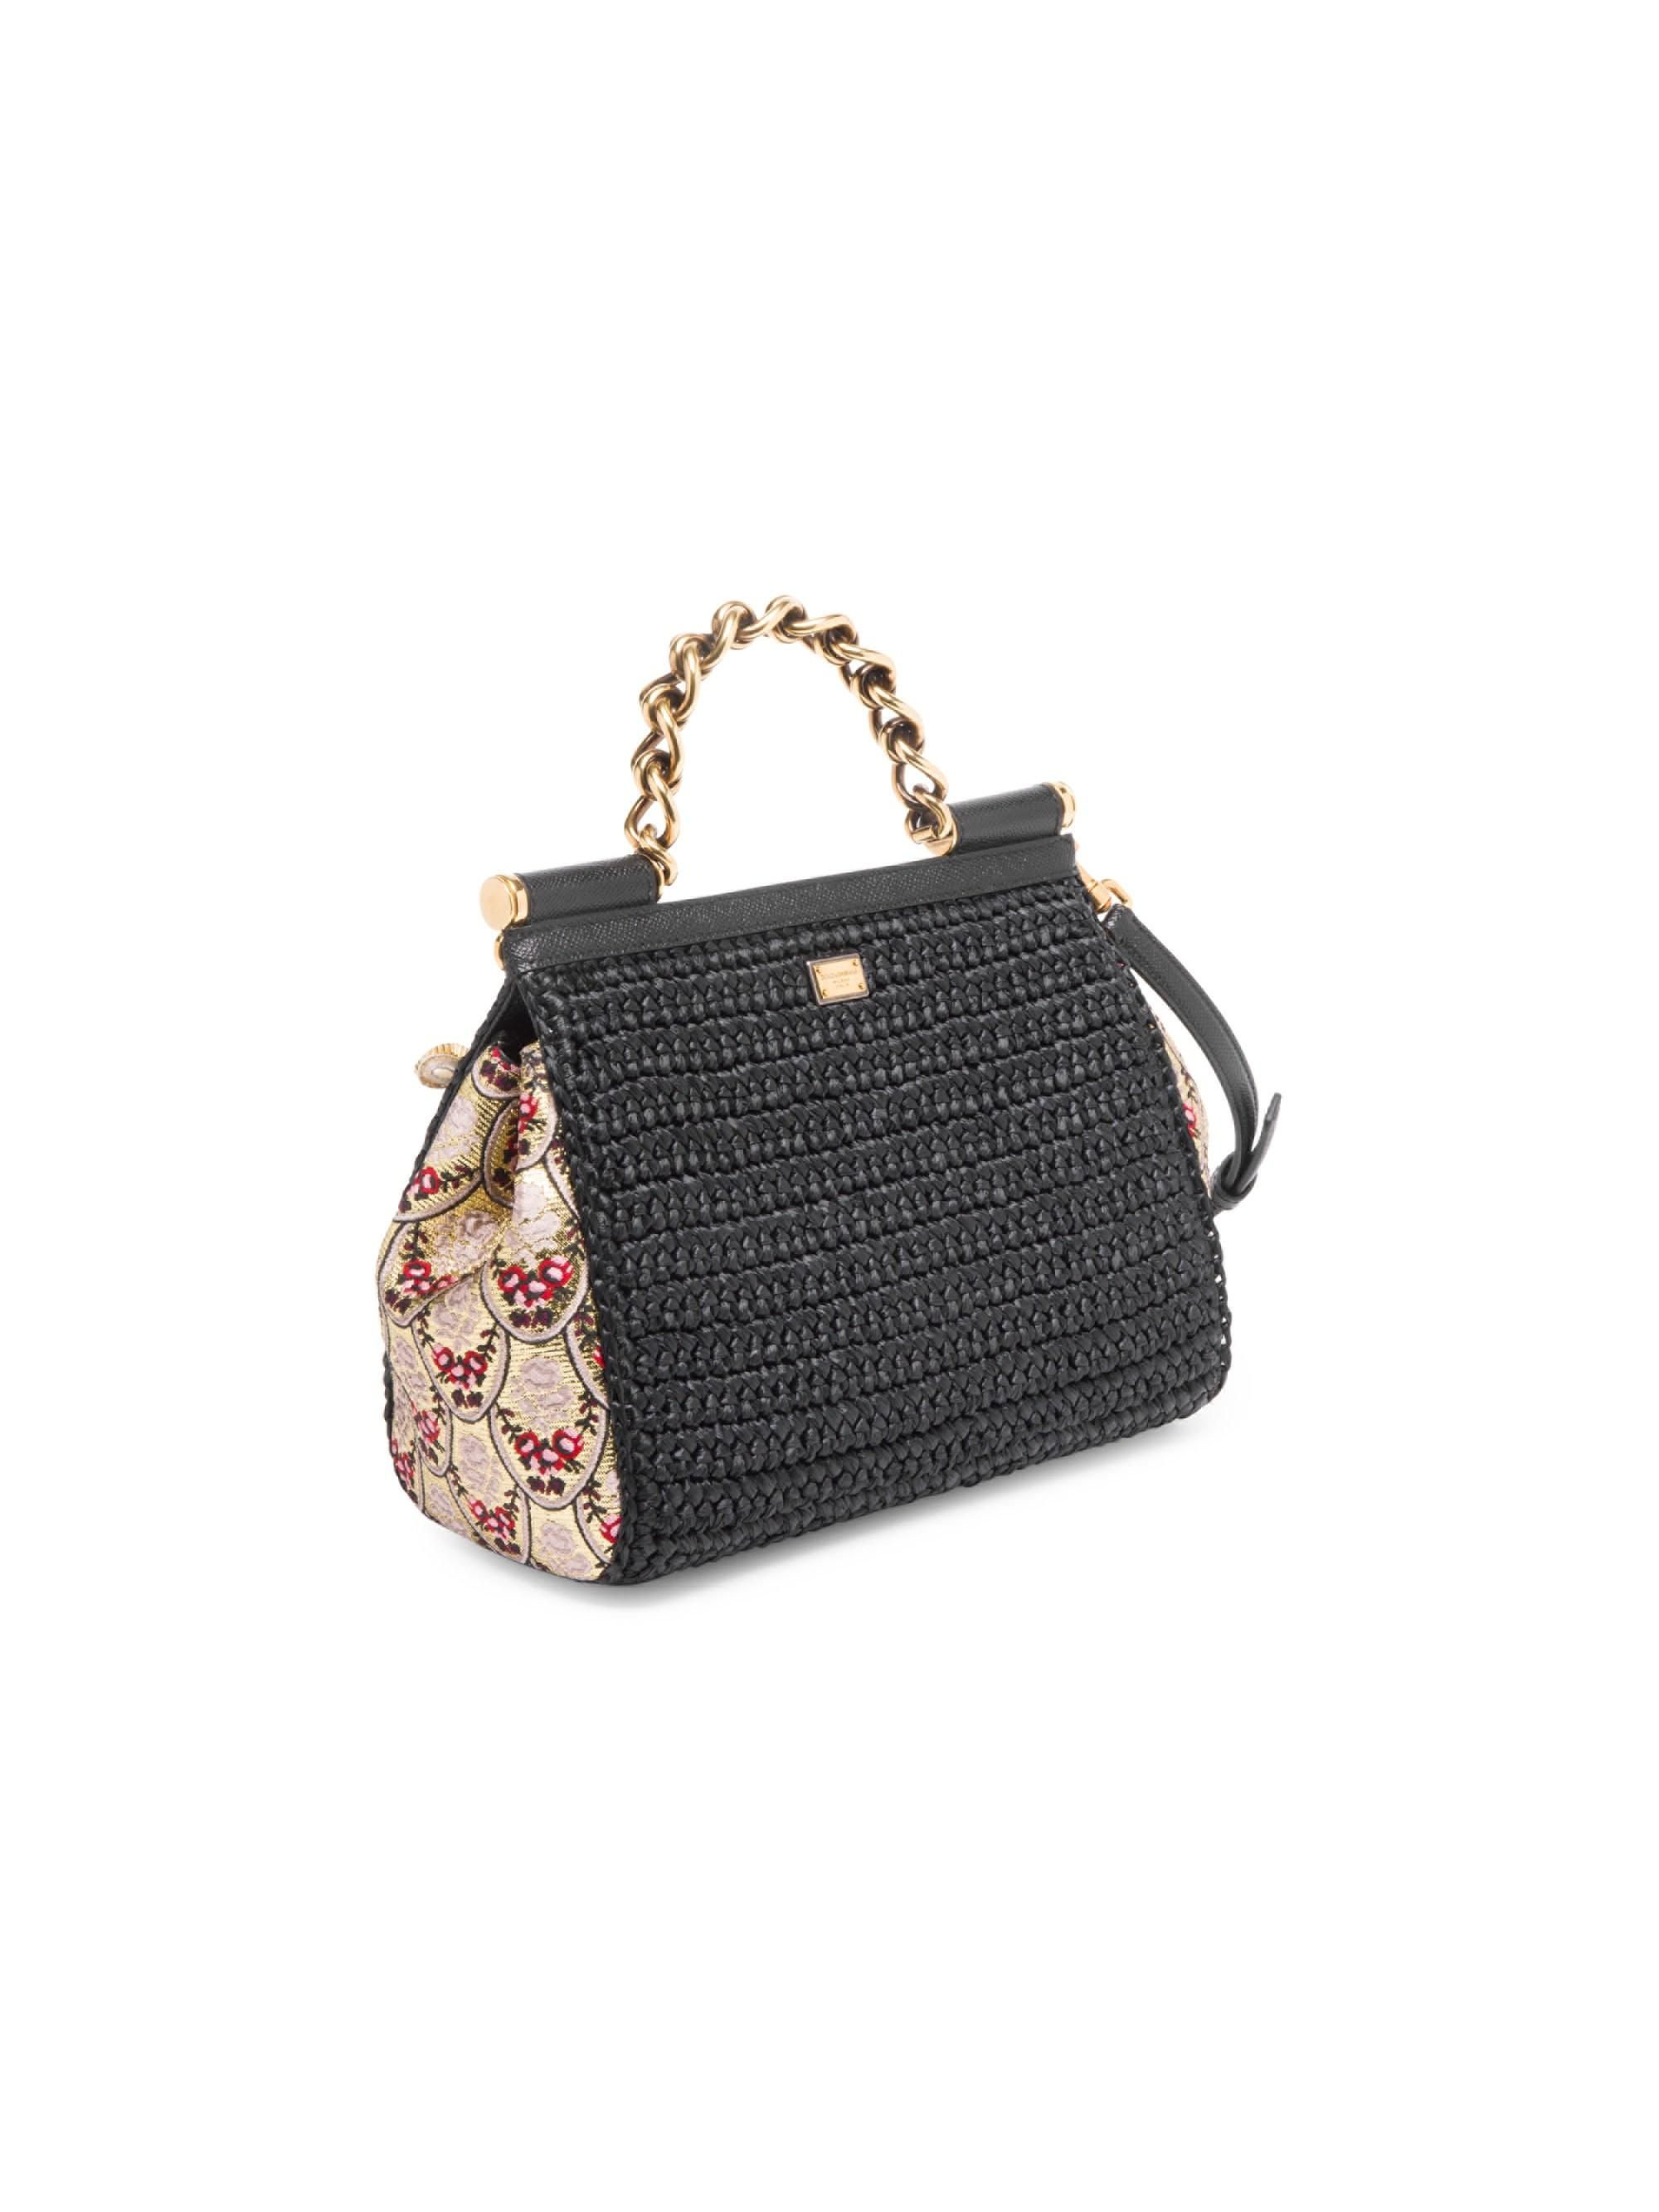 cefee14f18 Gallery. Previously sold at: Saks Fifth Avenue · Women's Balenciaga  Souvenir Women's Dior Miss Women's Dolce Gabbana ...